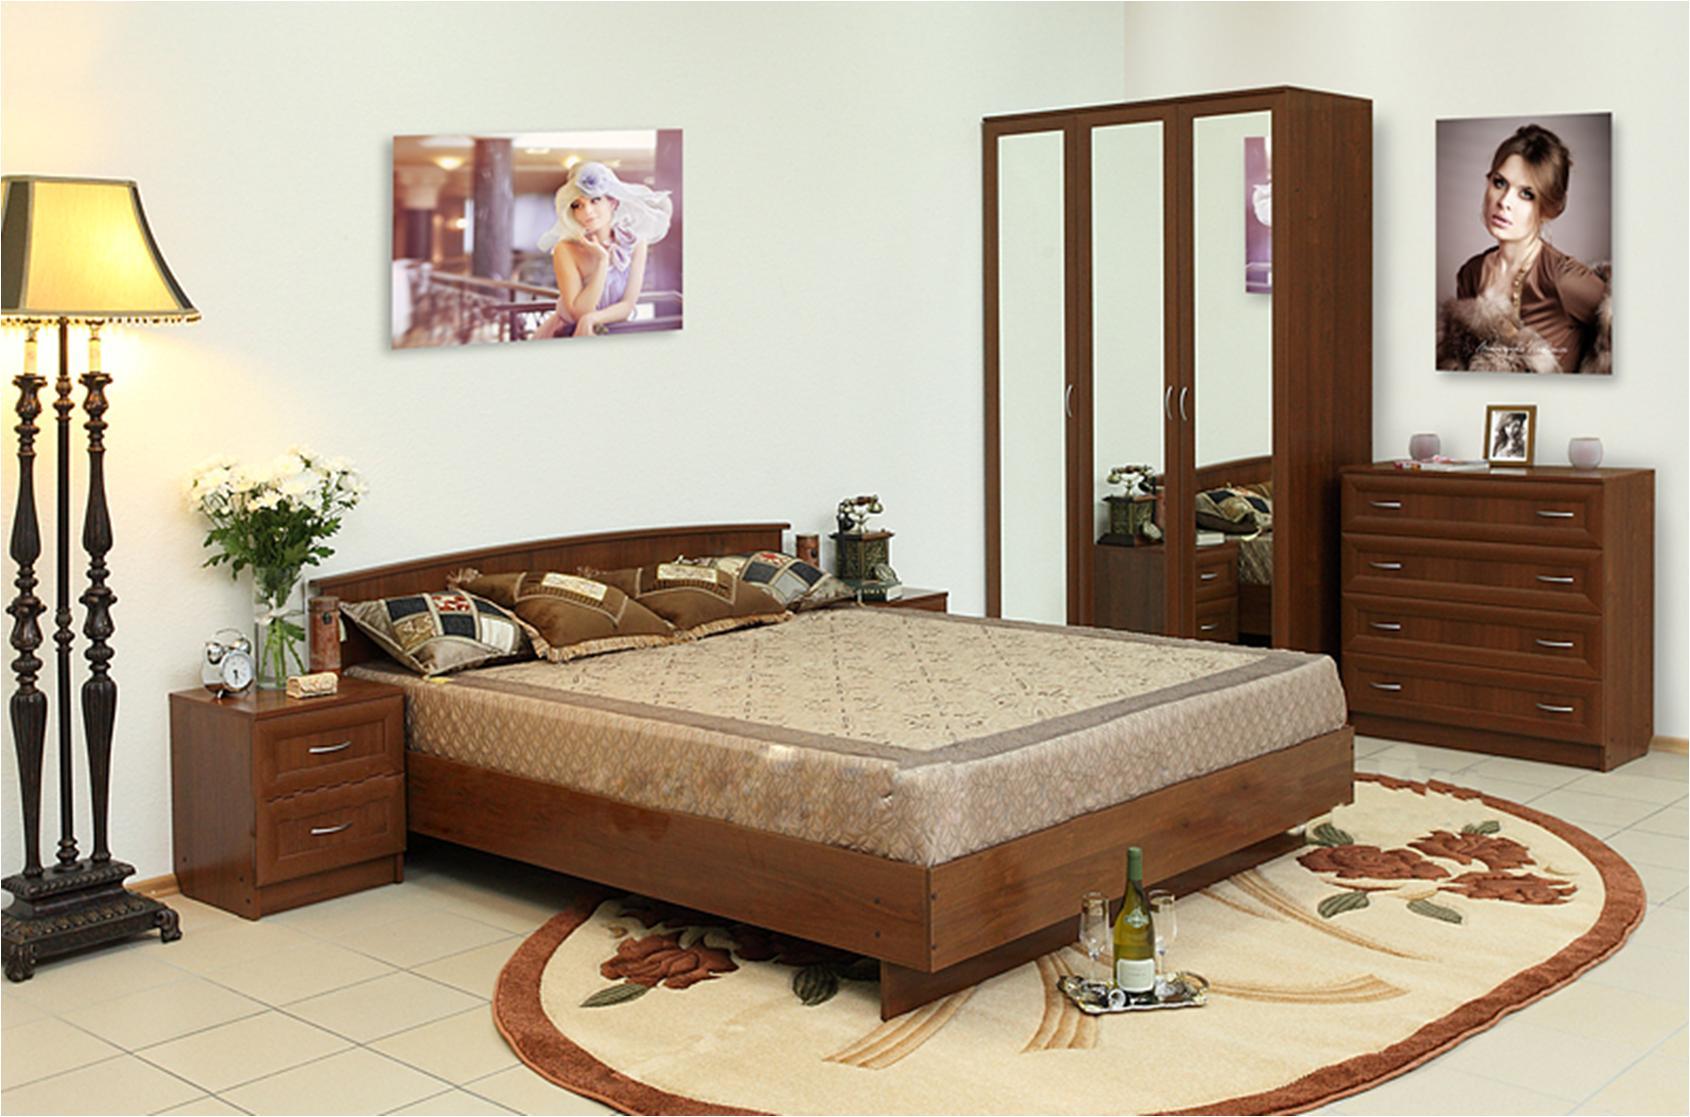 Спальня Светлана-М10 спальня светлана 2